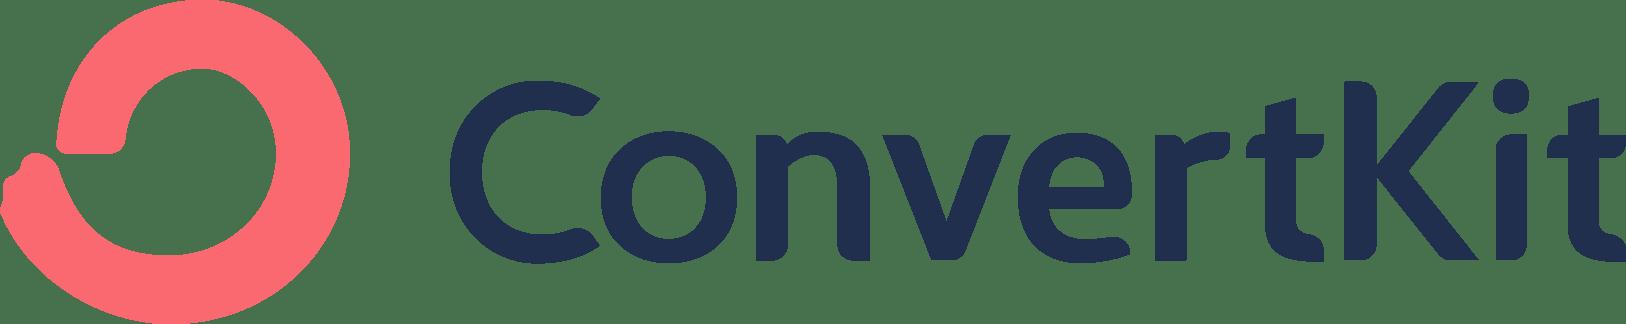 ConvertKit Logo